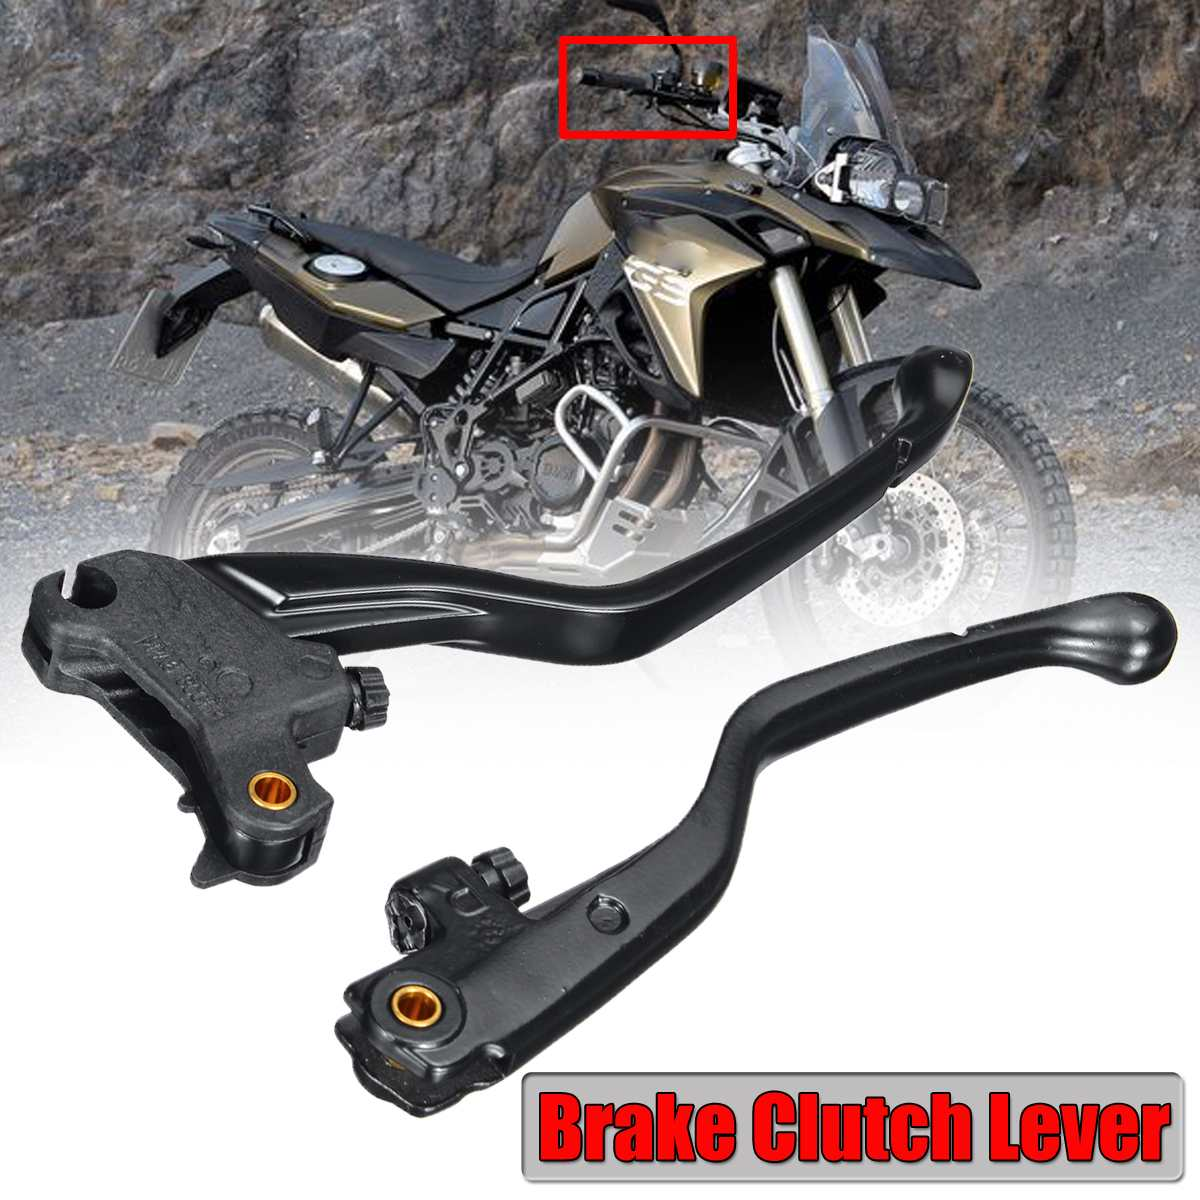 Black Aluminum Brake Clutch Lever For BMW K70 F700GS K71 F800GT K72 F800GS